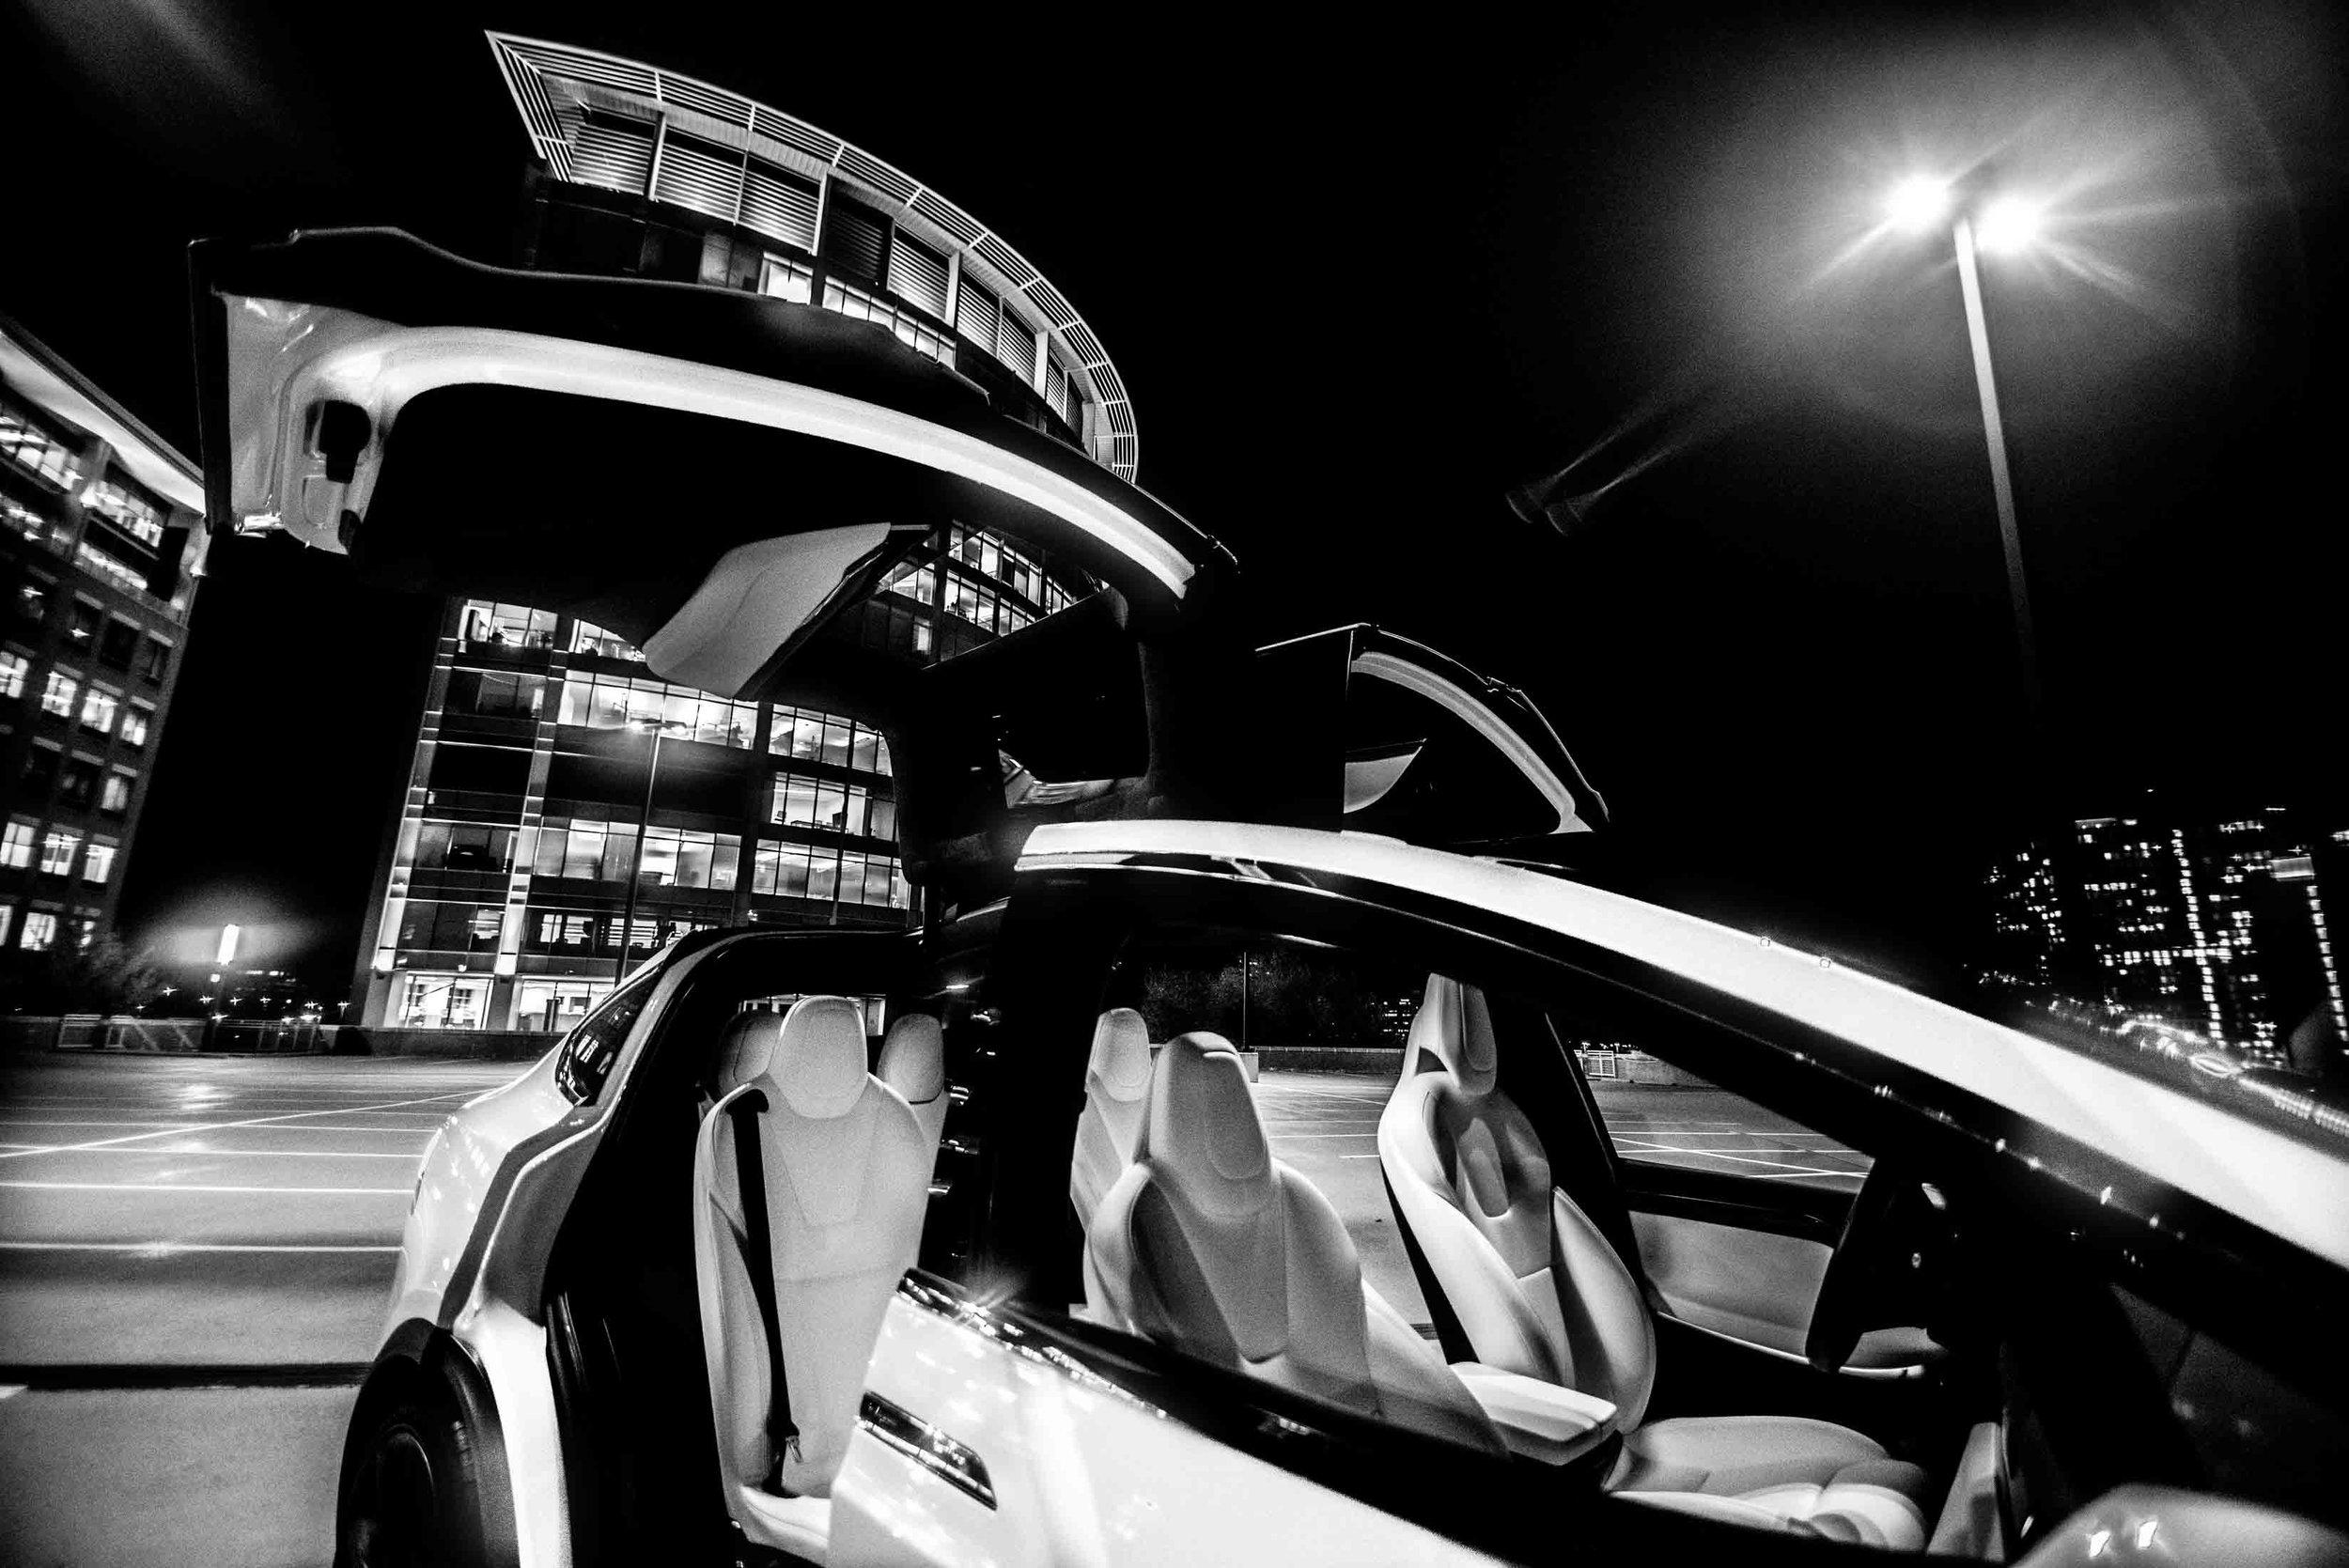 fleet+vehicle+sexy+car+photo+video+speed+tesla+p100d+vadym+guliuk+photography-17.jpg